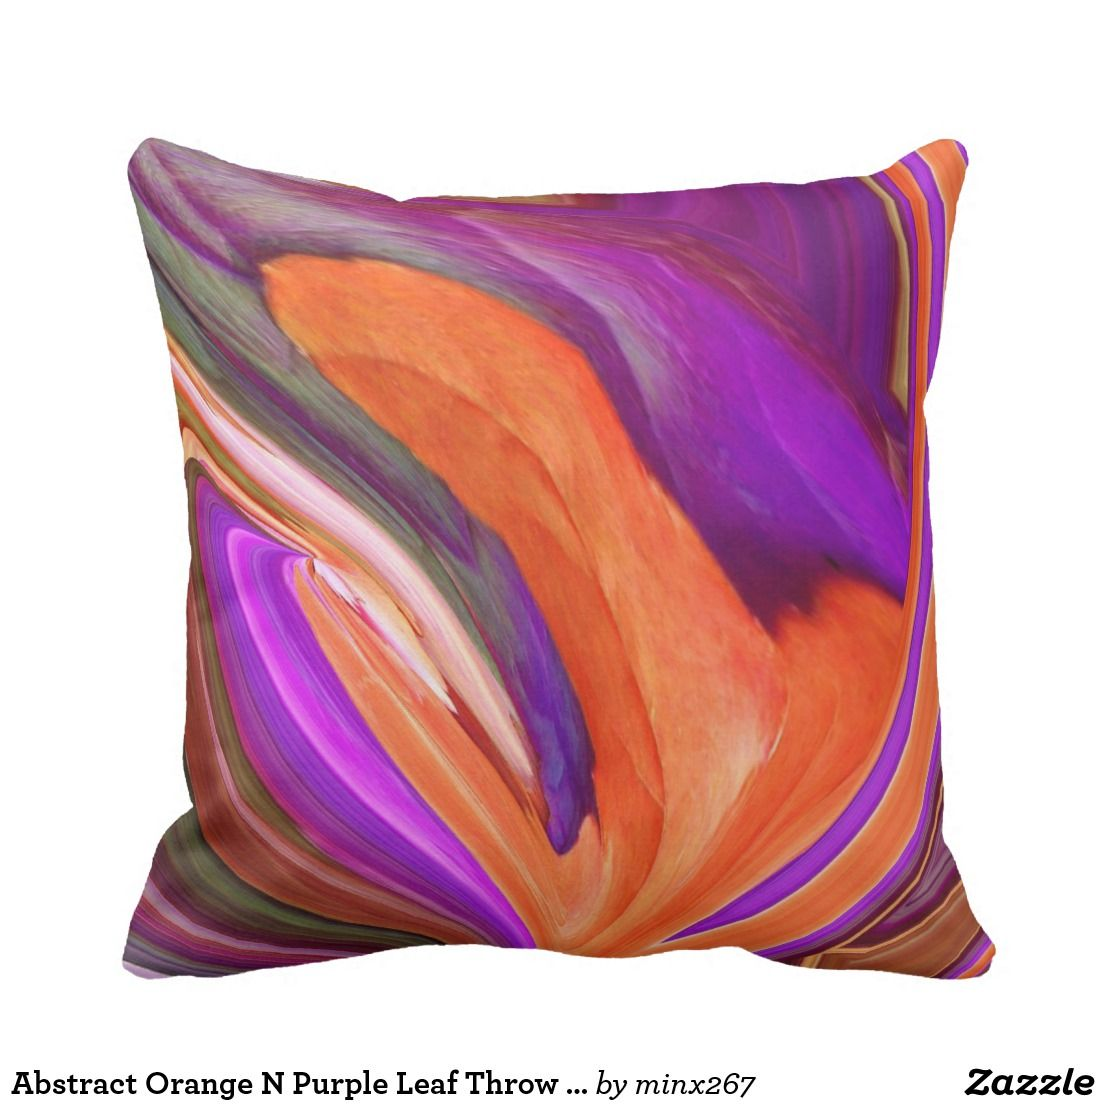 Abstract Orange N Purple Leaf Throw Pillow Zazzle Com Throw Pillows Orange And Purple Pillows